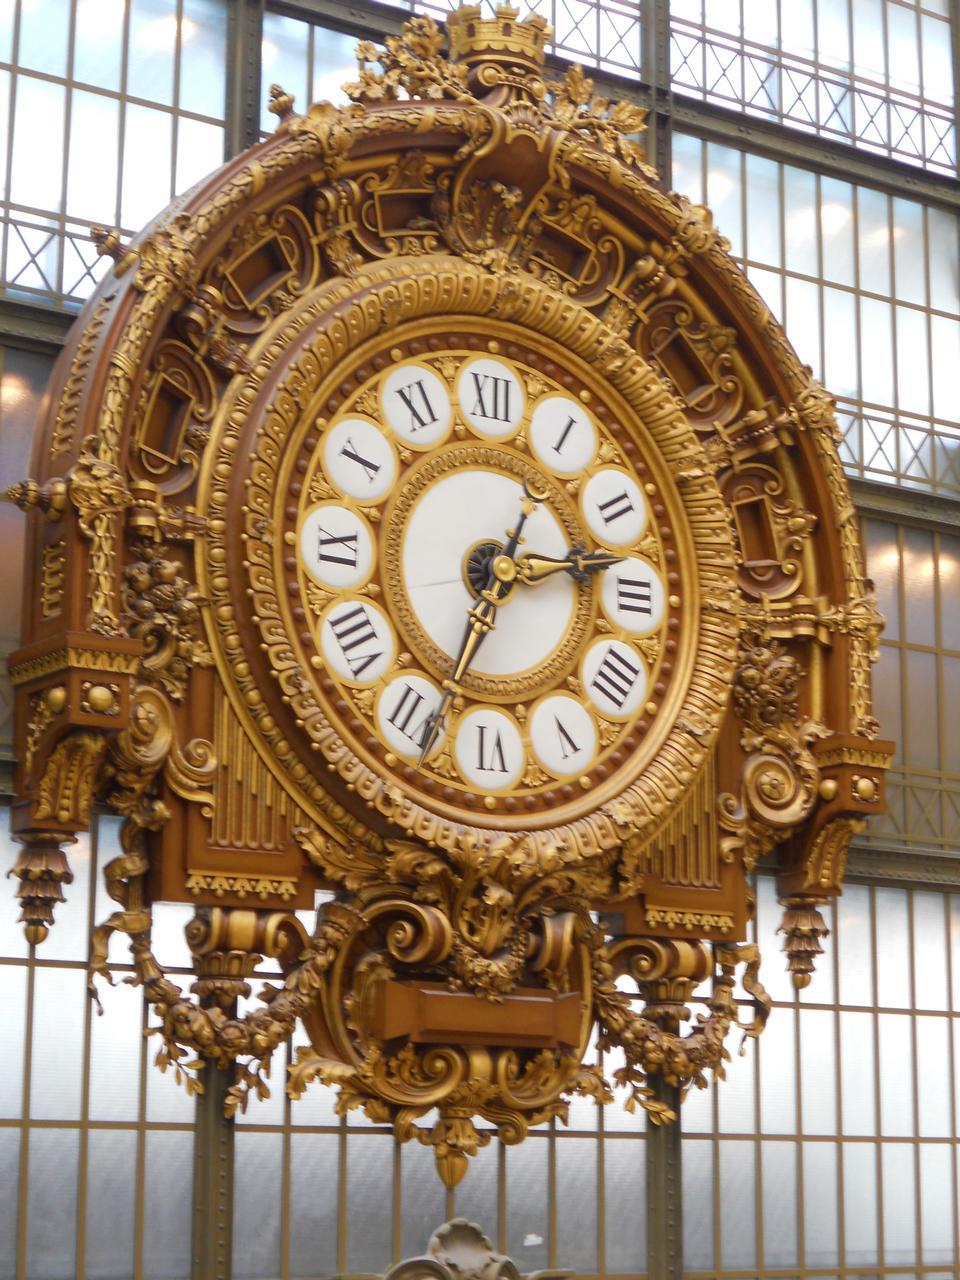 Musée d'Orsay Clock, Main Hall